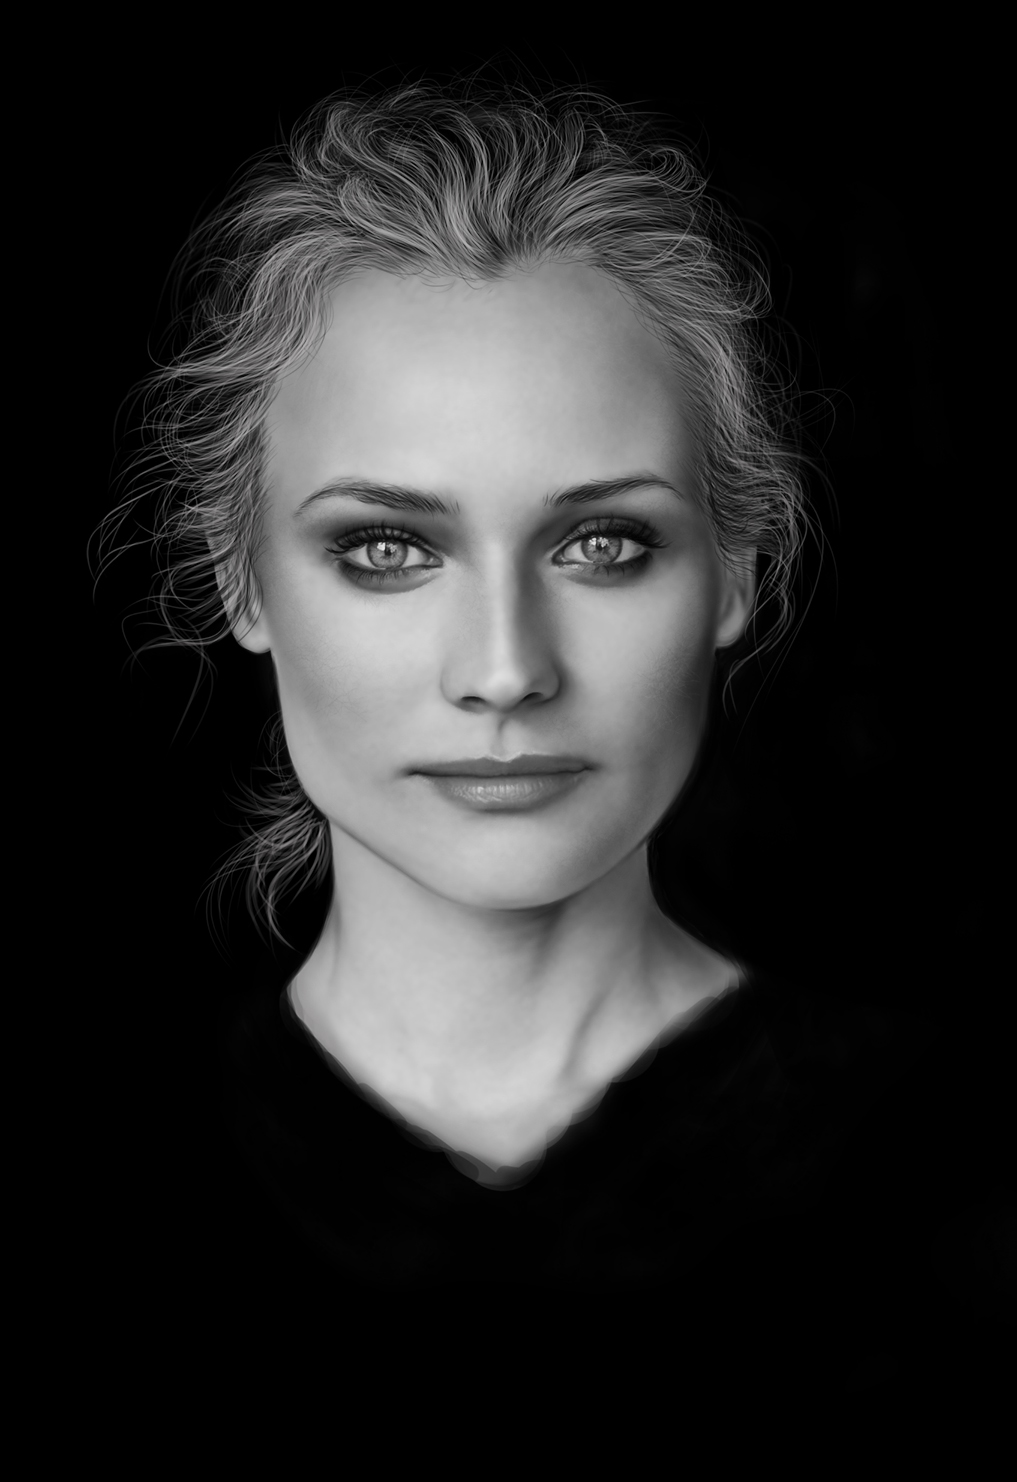 Diane Kruger by vannenov